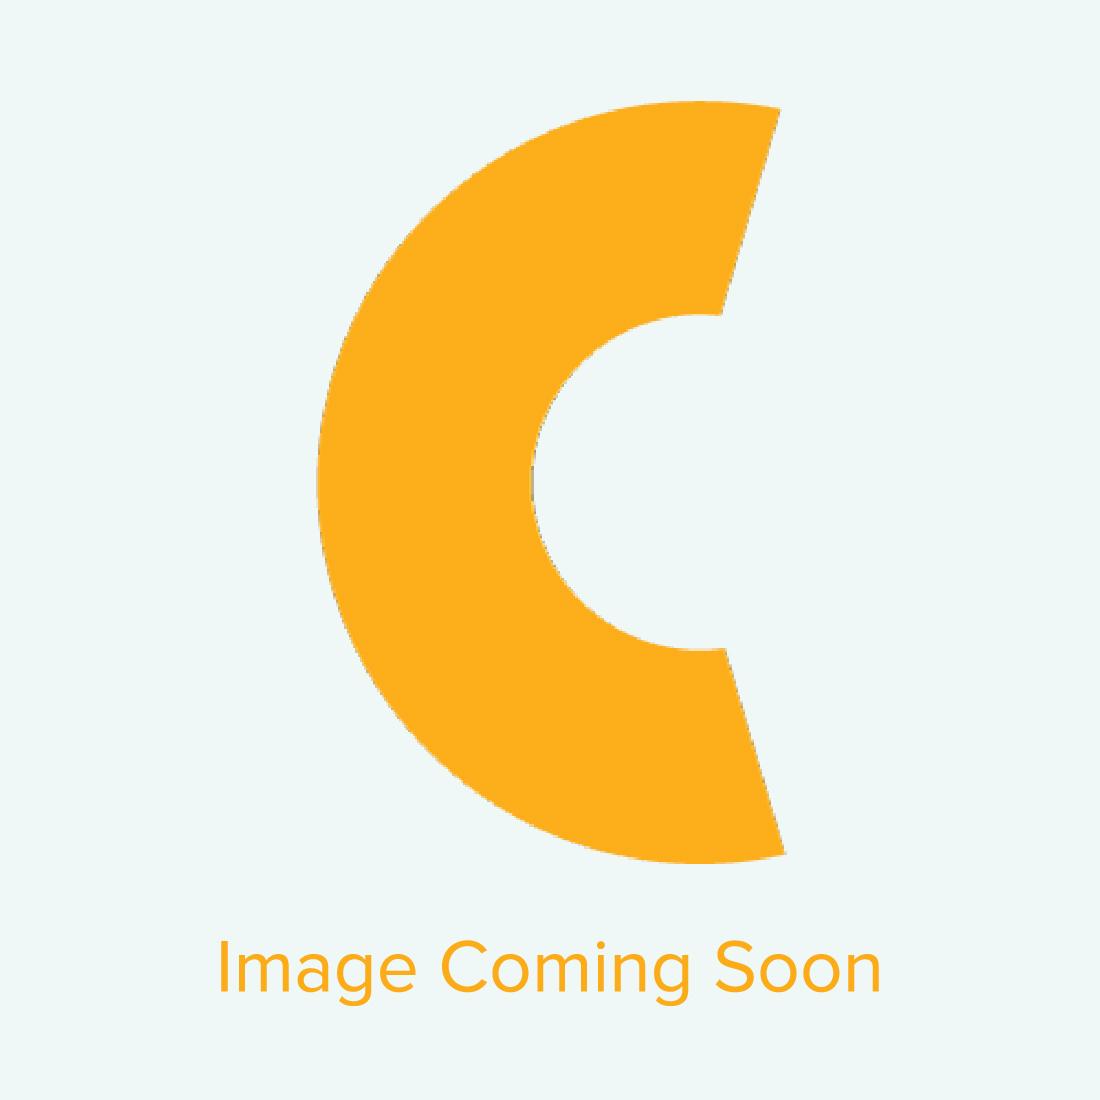 "Image Clip Laser Dark Heat Transfer Paper for Laser Printers Sample Pack - 8.5"" x 11"" (5 sheets)"